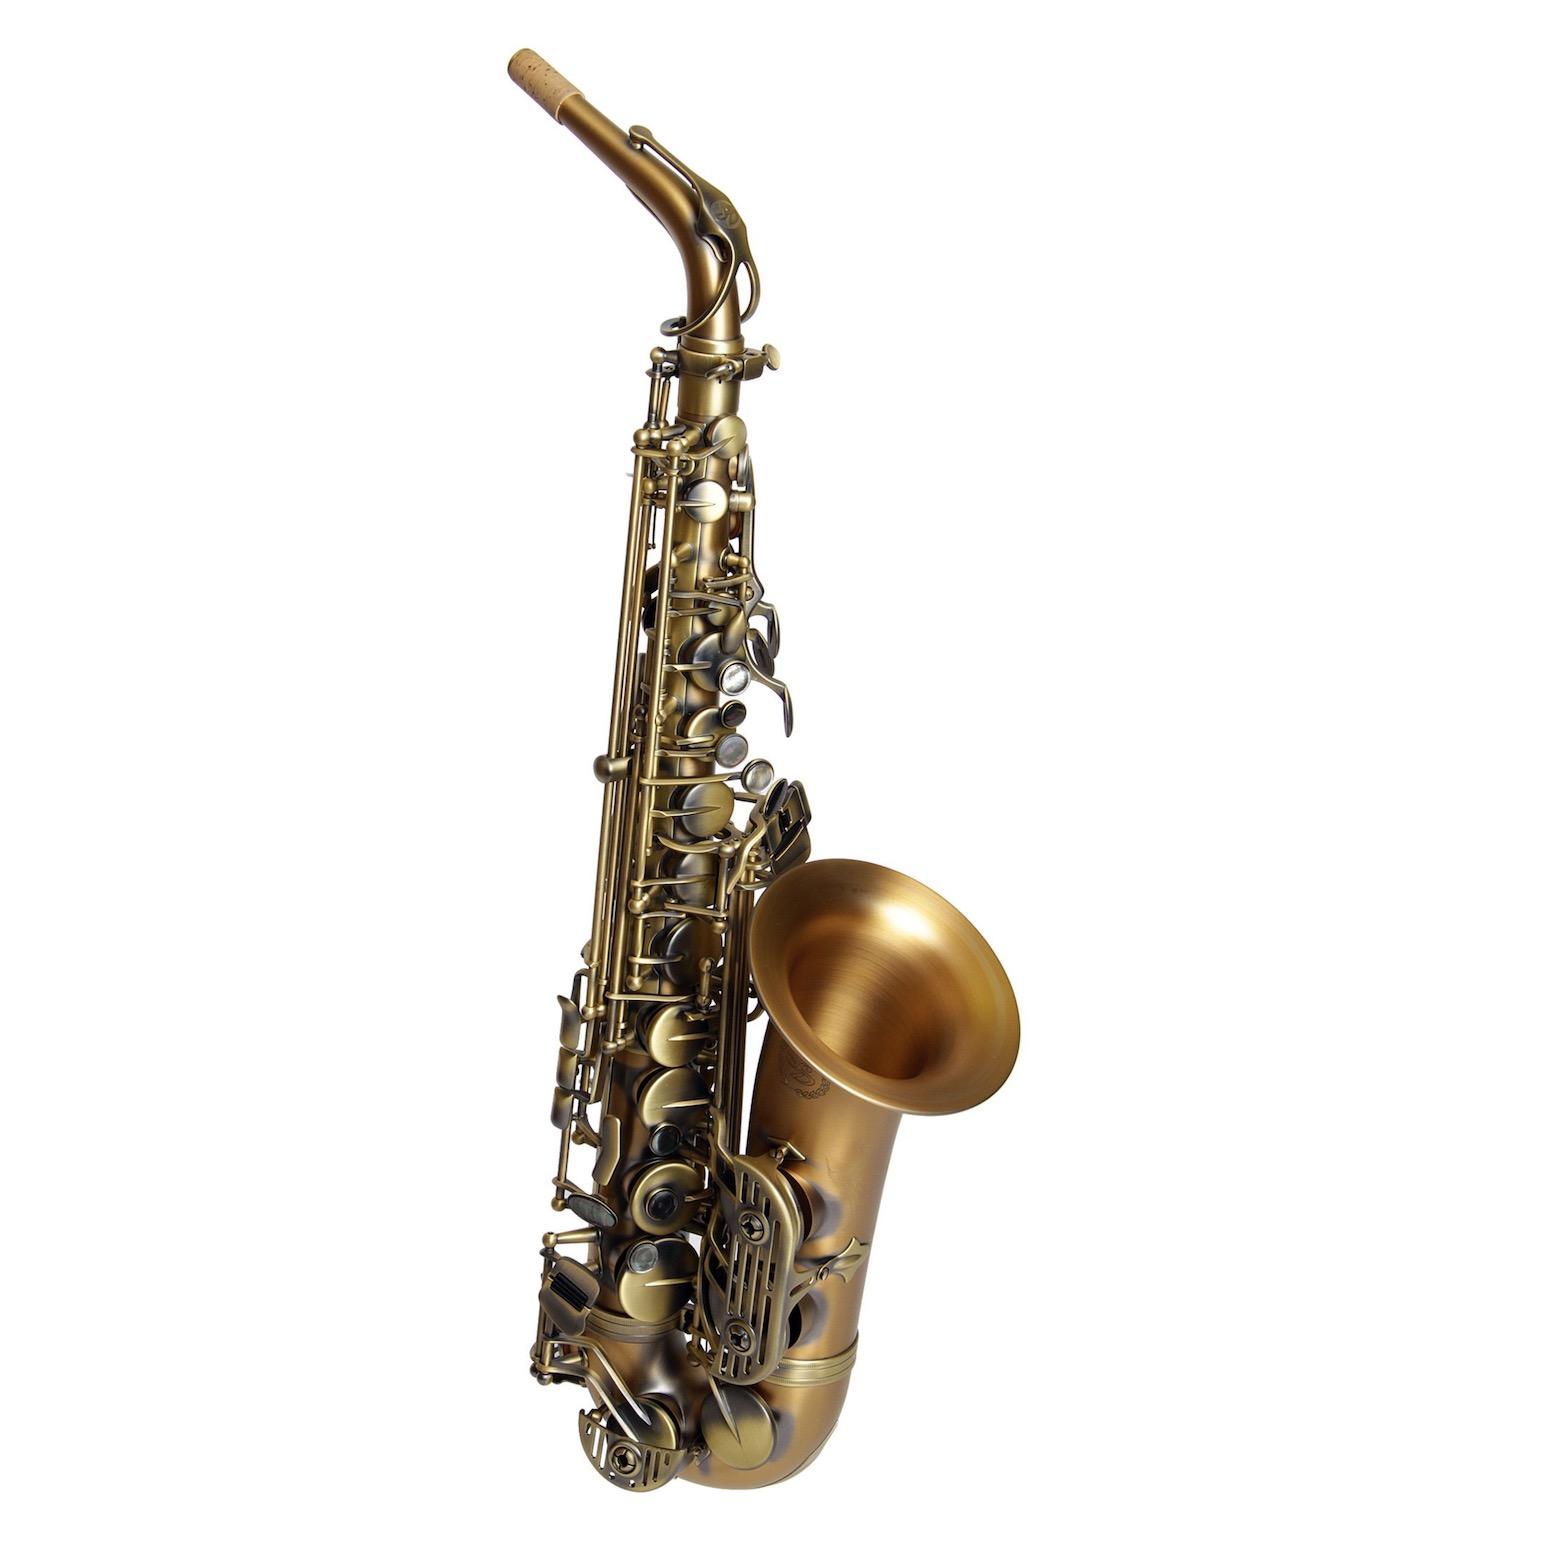 Dakota Alto Saxophone - Antique Brass Finish